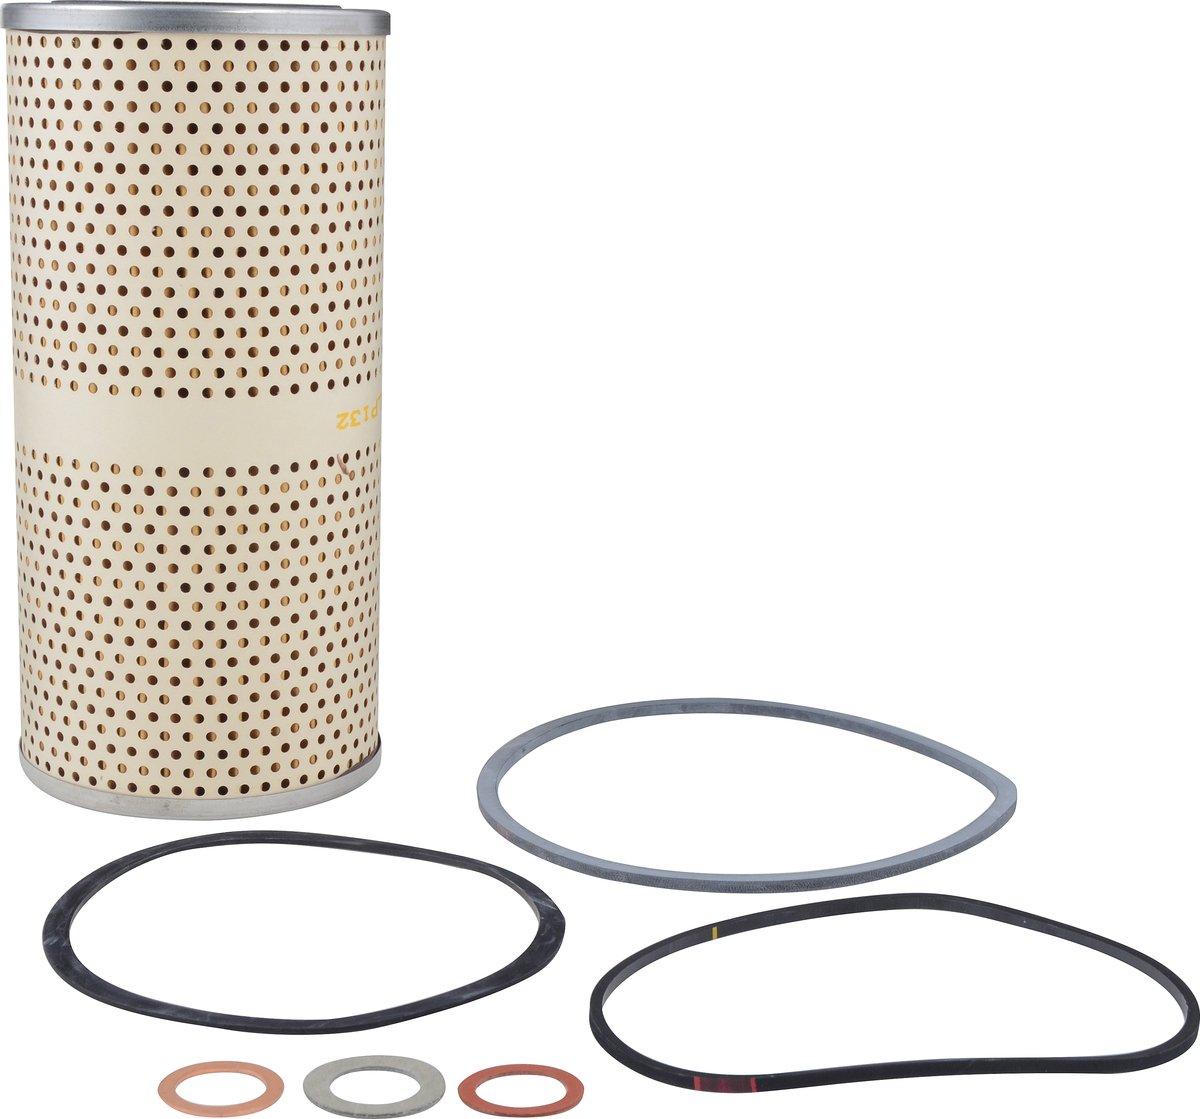 Luber-finer LP132 Heavy Duty Oil Filter